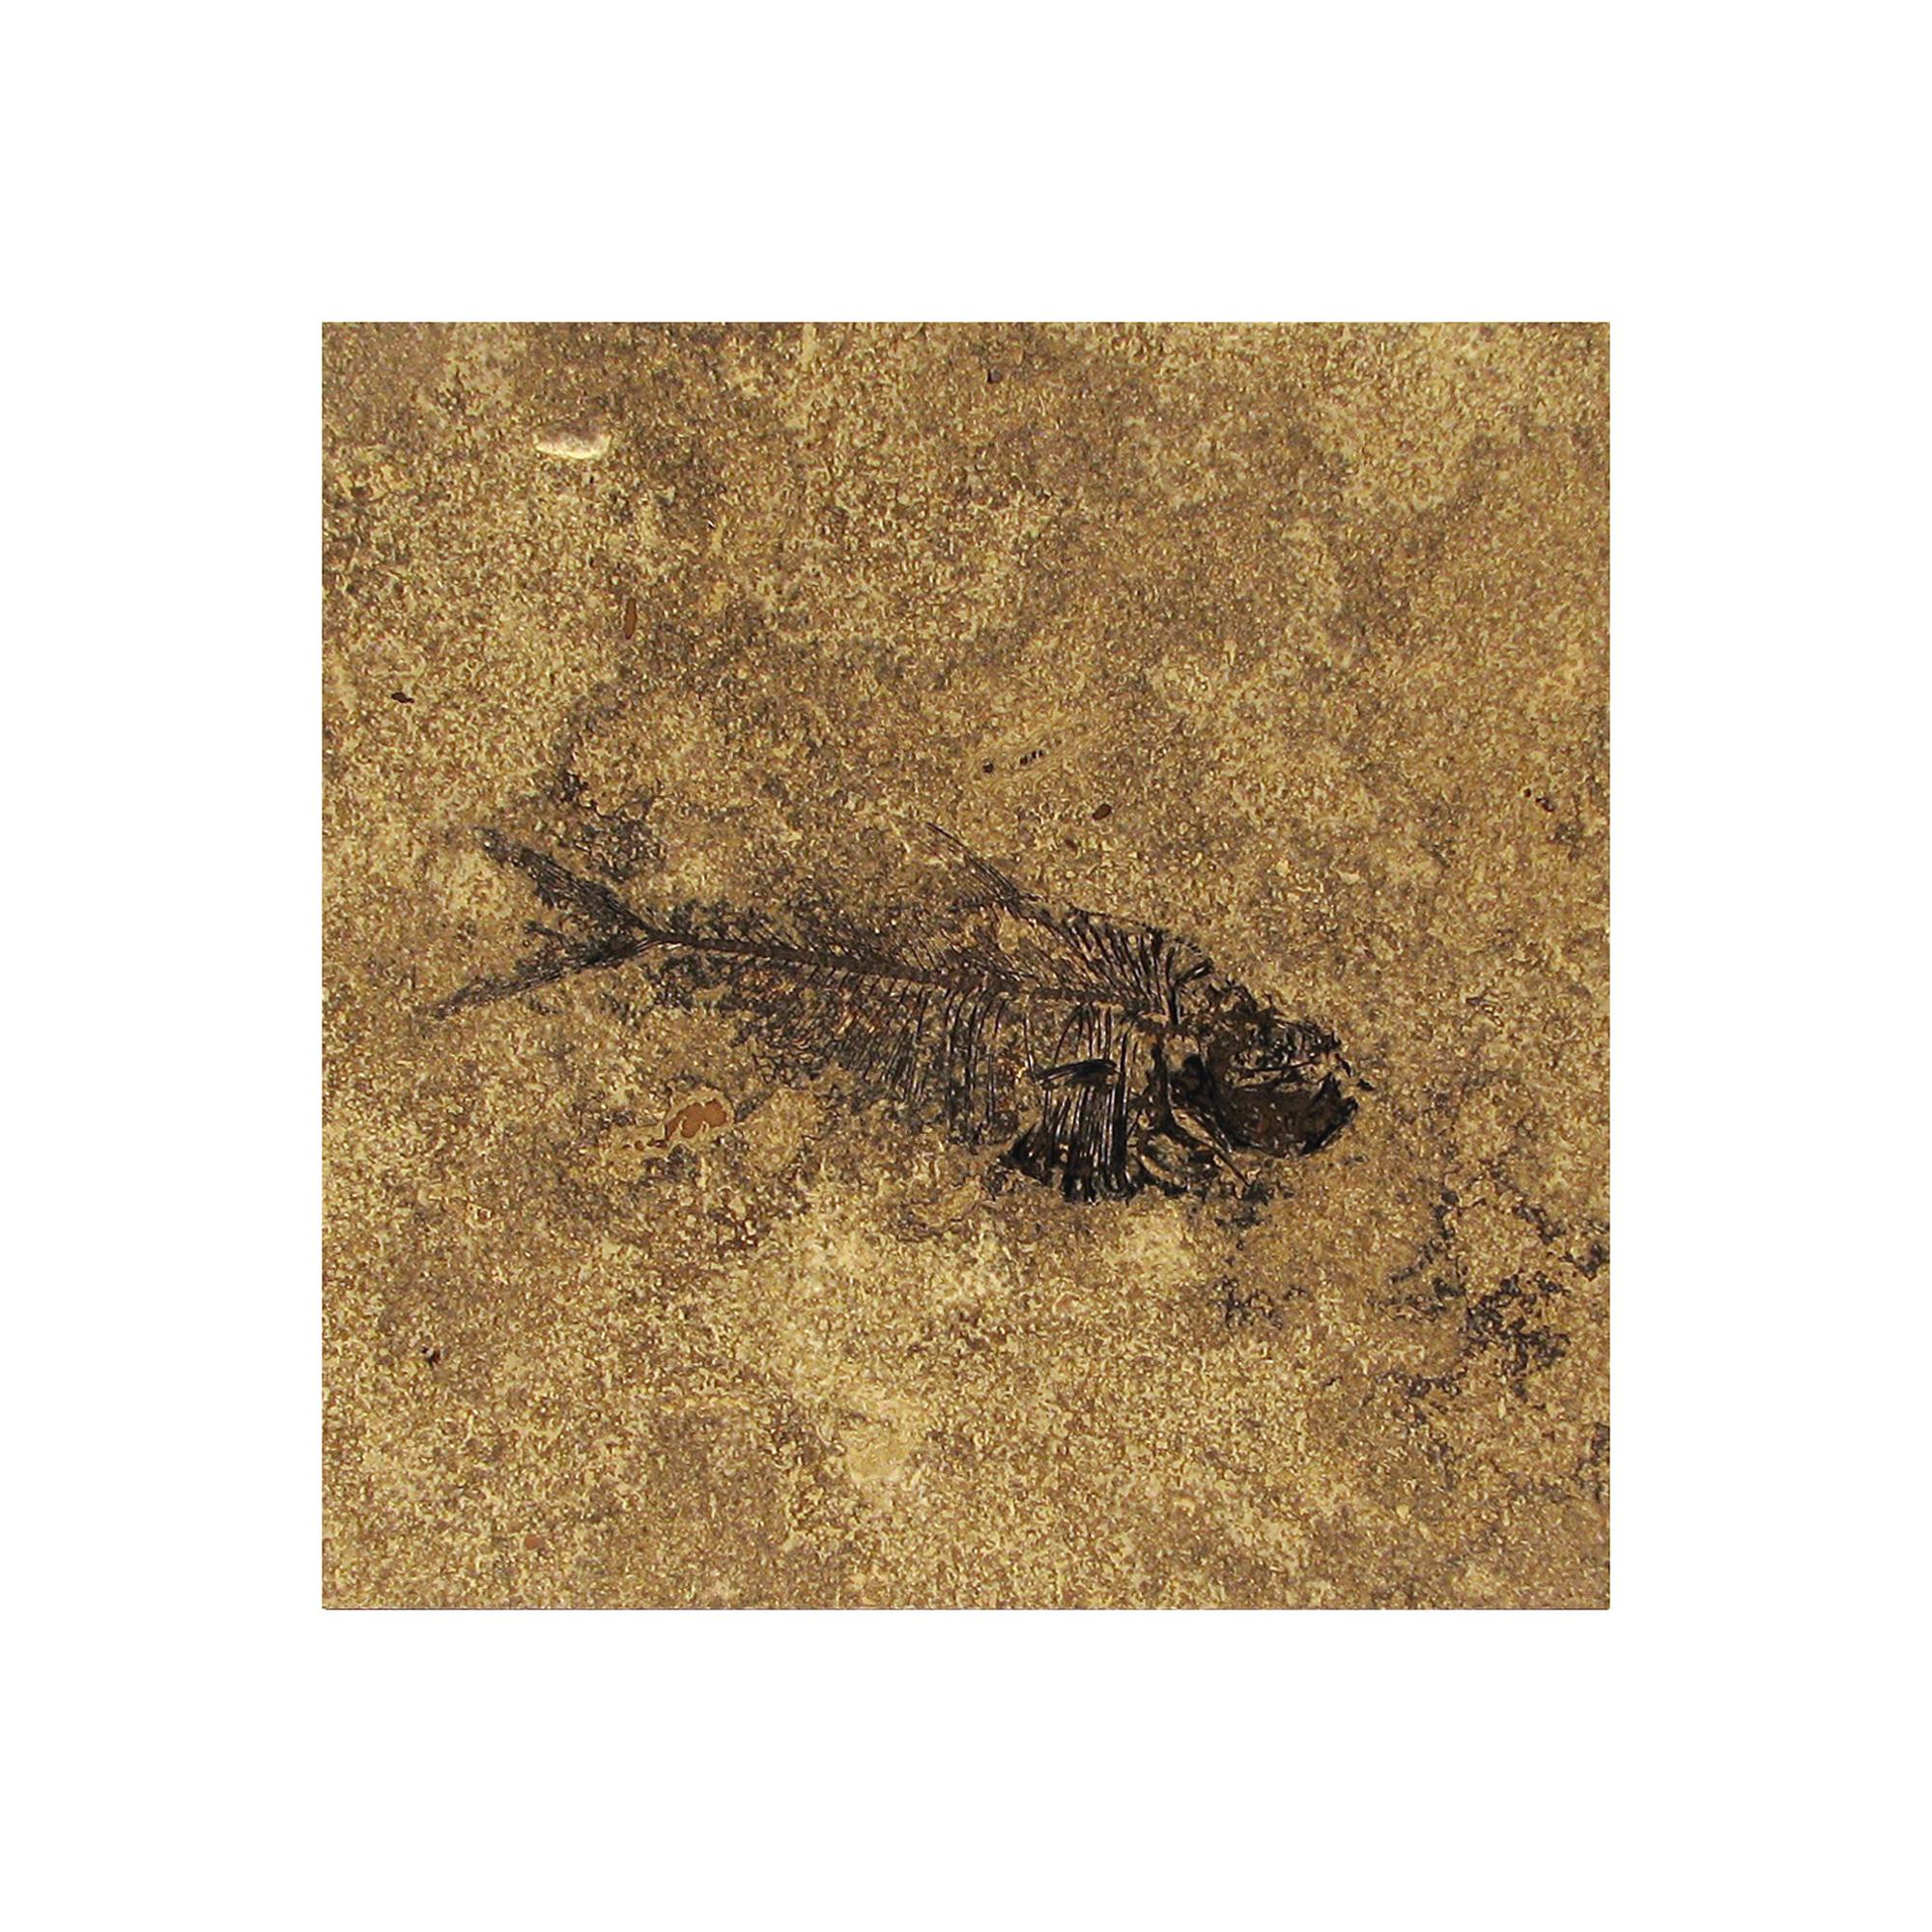 Fossil Tile (Honed) DR88_H066